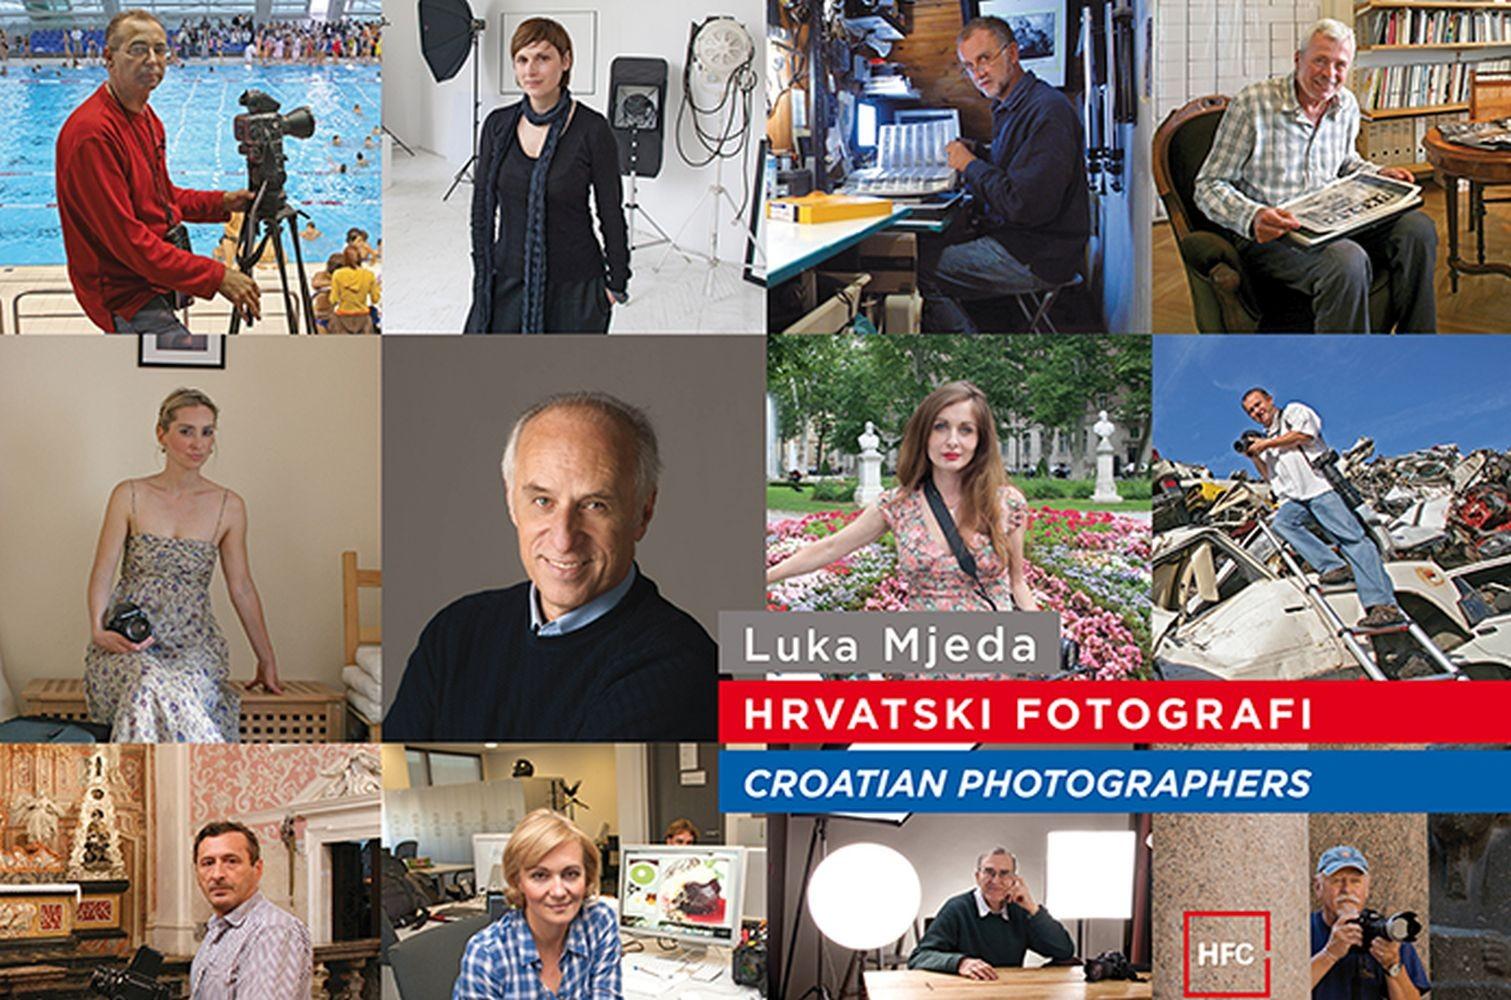 Hrvatski fotografi - Croatian Photographers